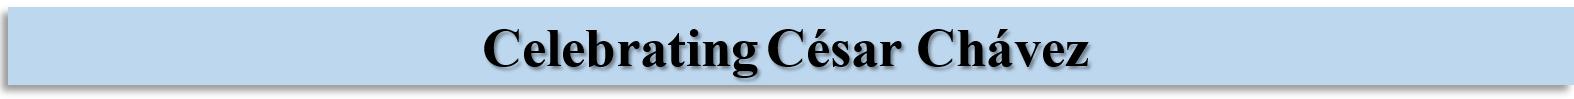 Cesar Chavez banner2